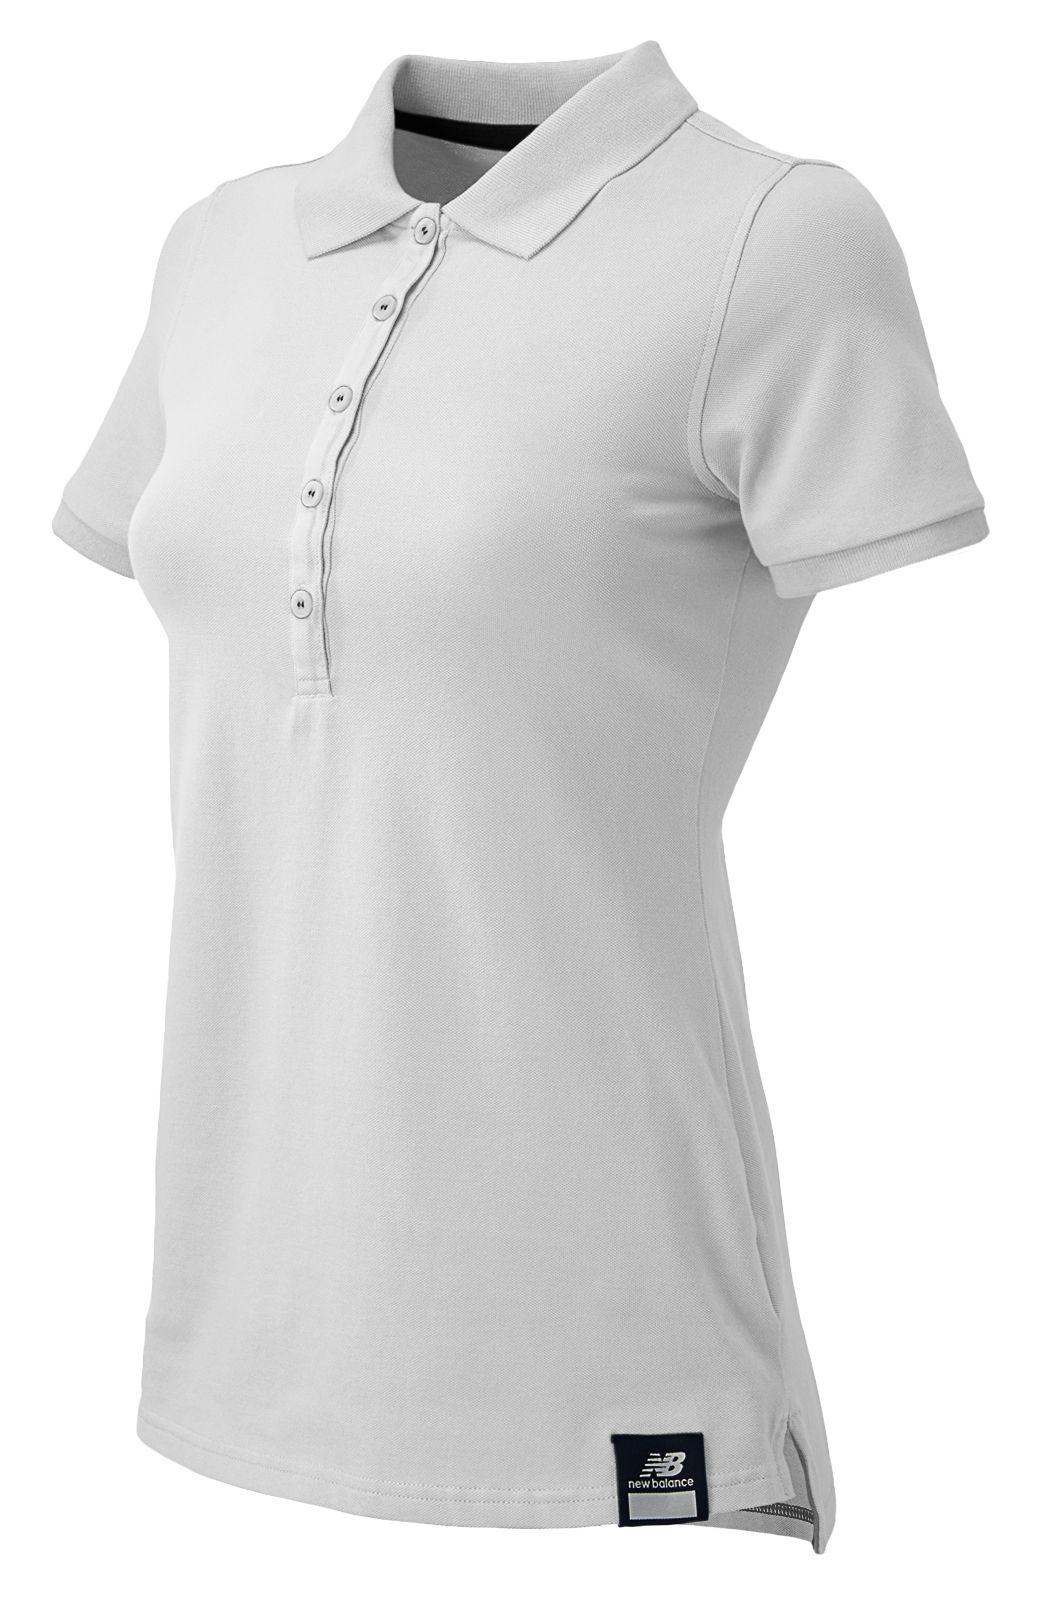 New Balance 5167 Women's Essential Polo : WET5167WT